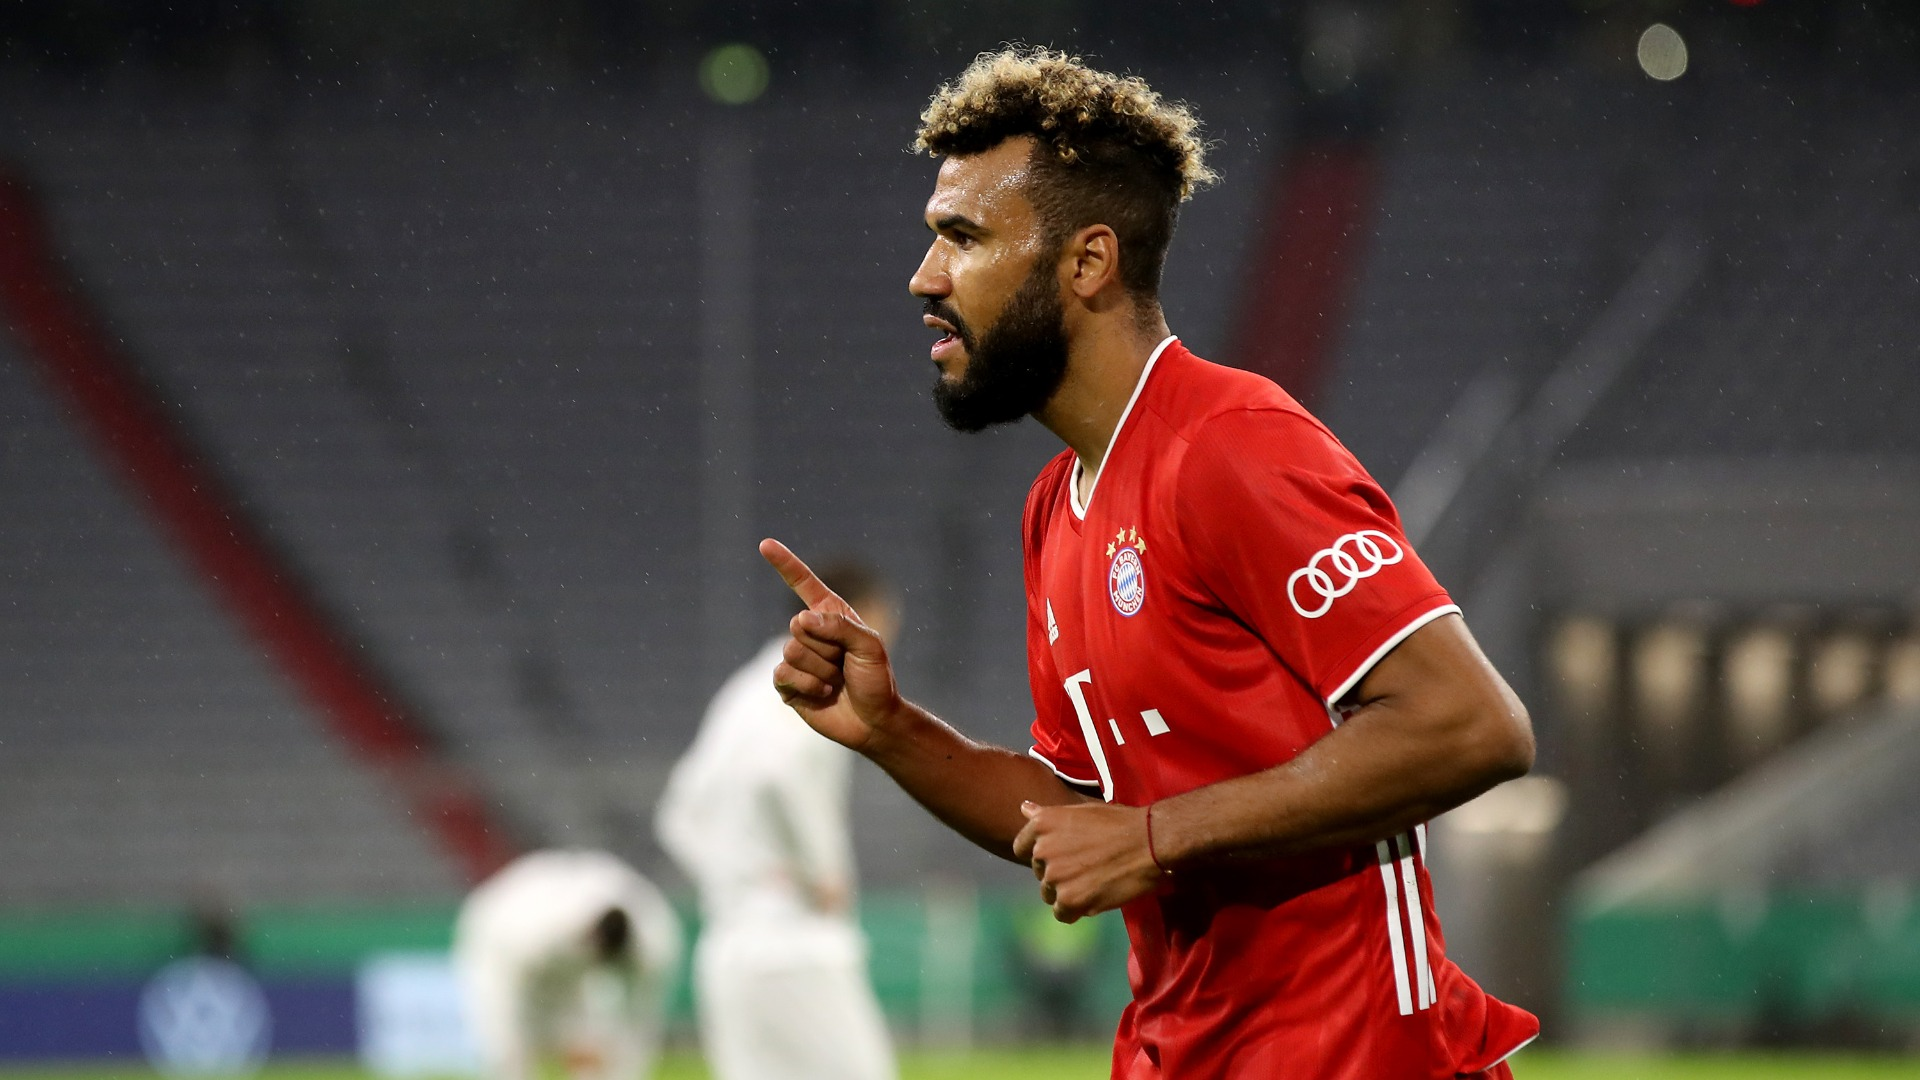 Duren 0-3 Bayern Munich: Choupo-Moting claims debut double against spirited minnows